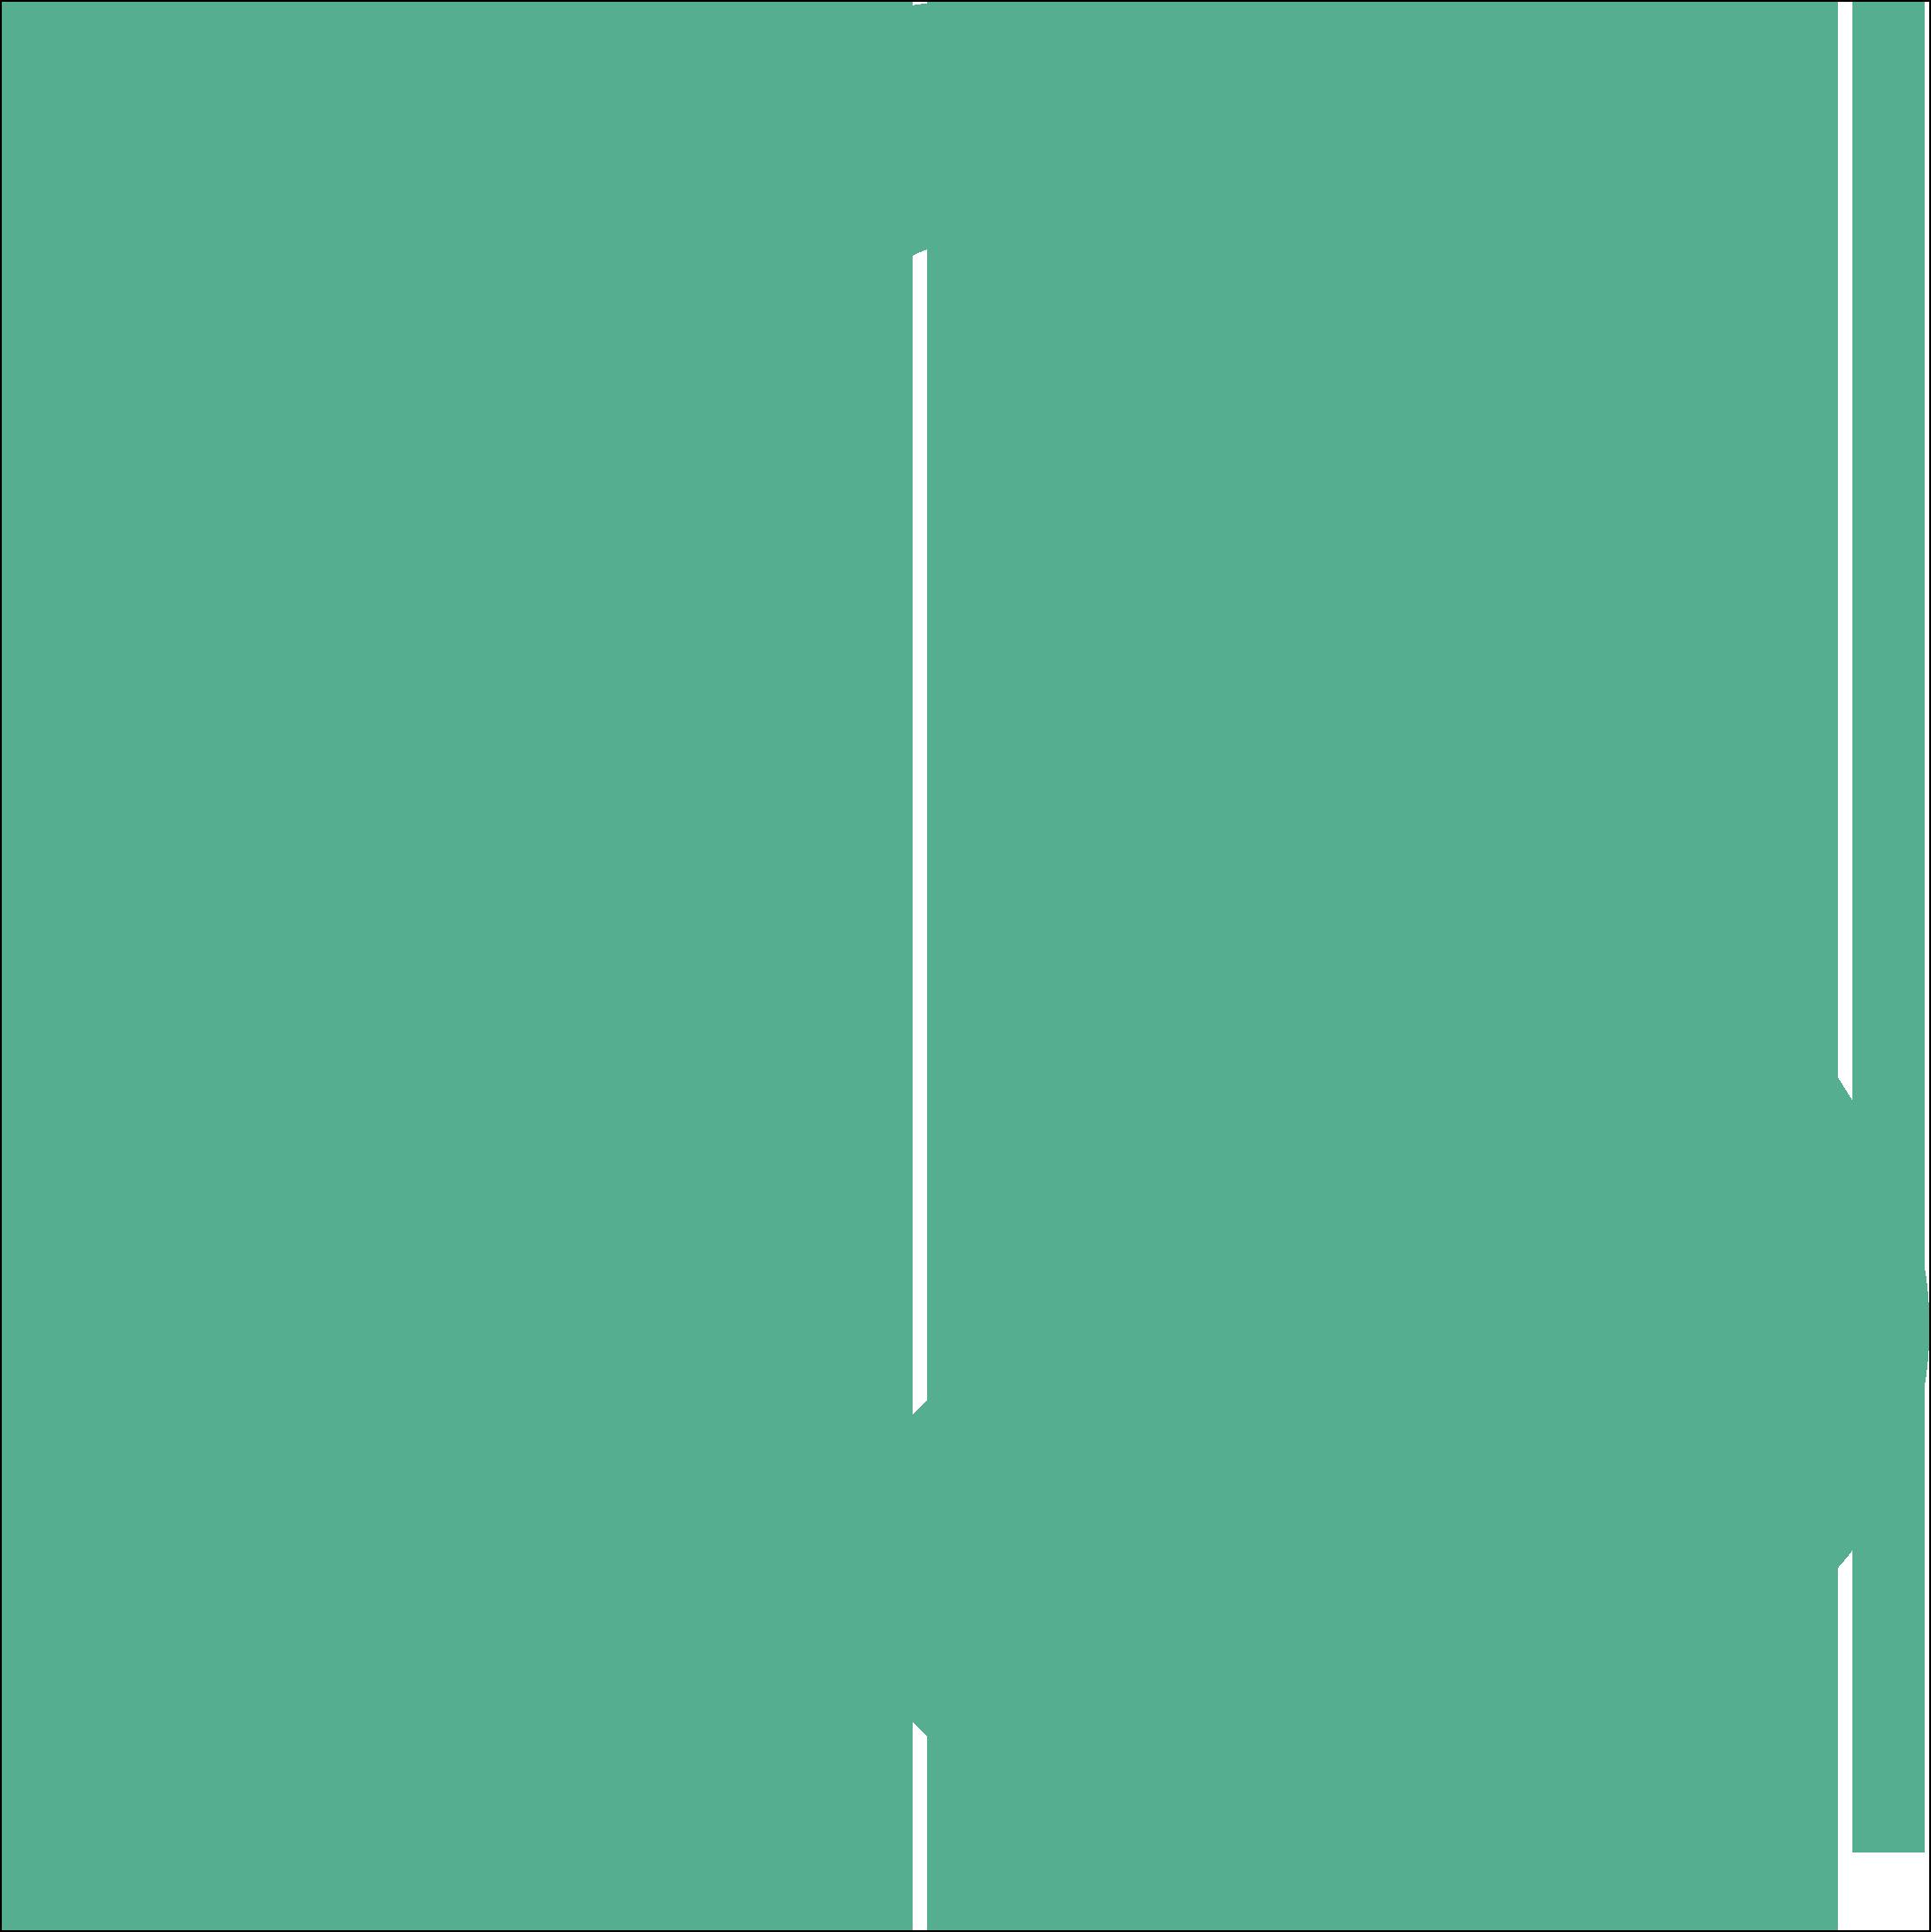 Recycle arrows icon.